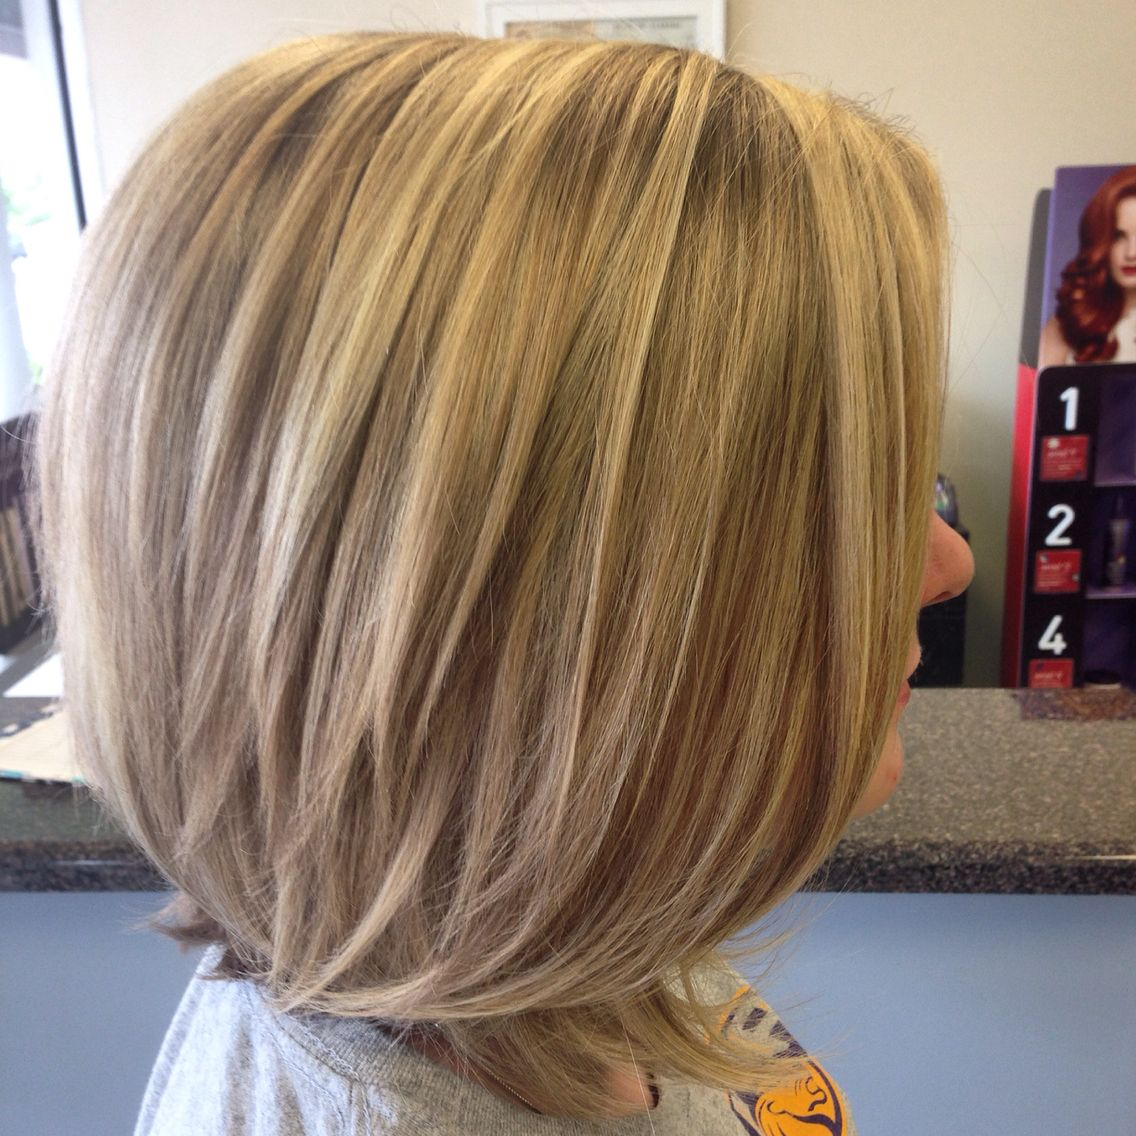 Dark blonde hair with highlights. Long bob haircut